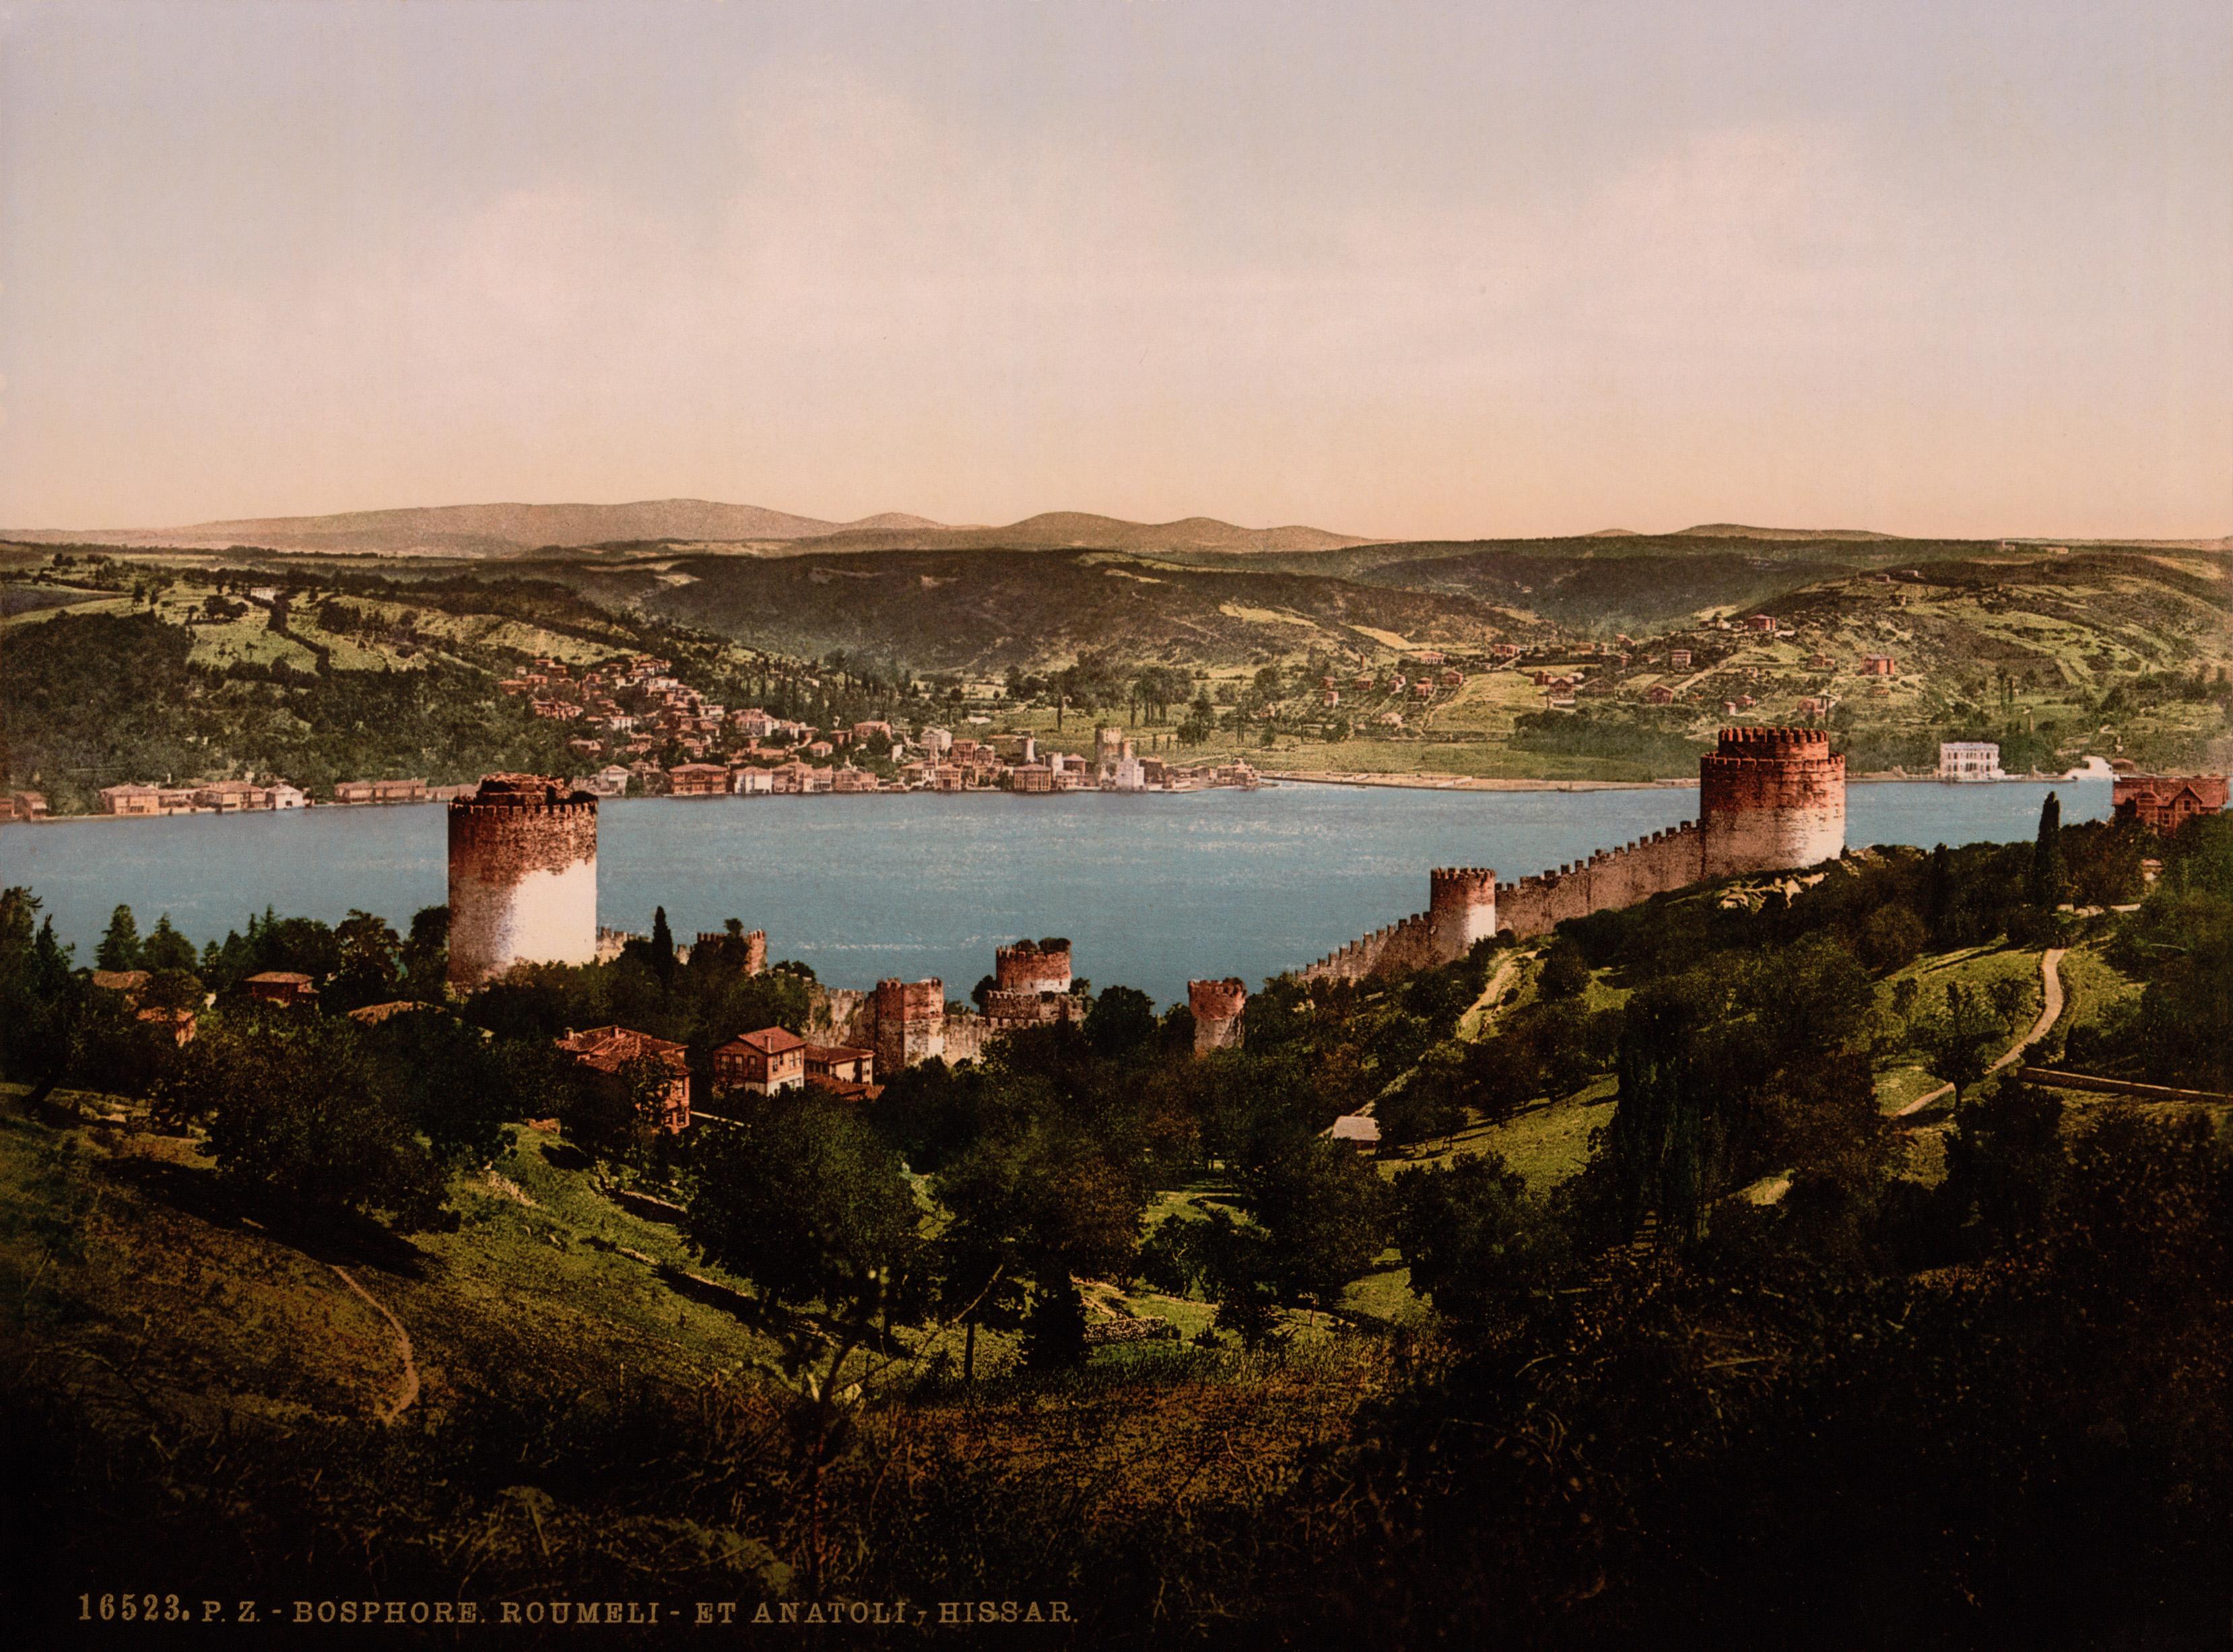 C A Turkey Istanbul File:Bosphorus, Rumeli...